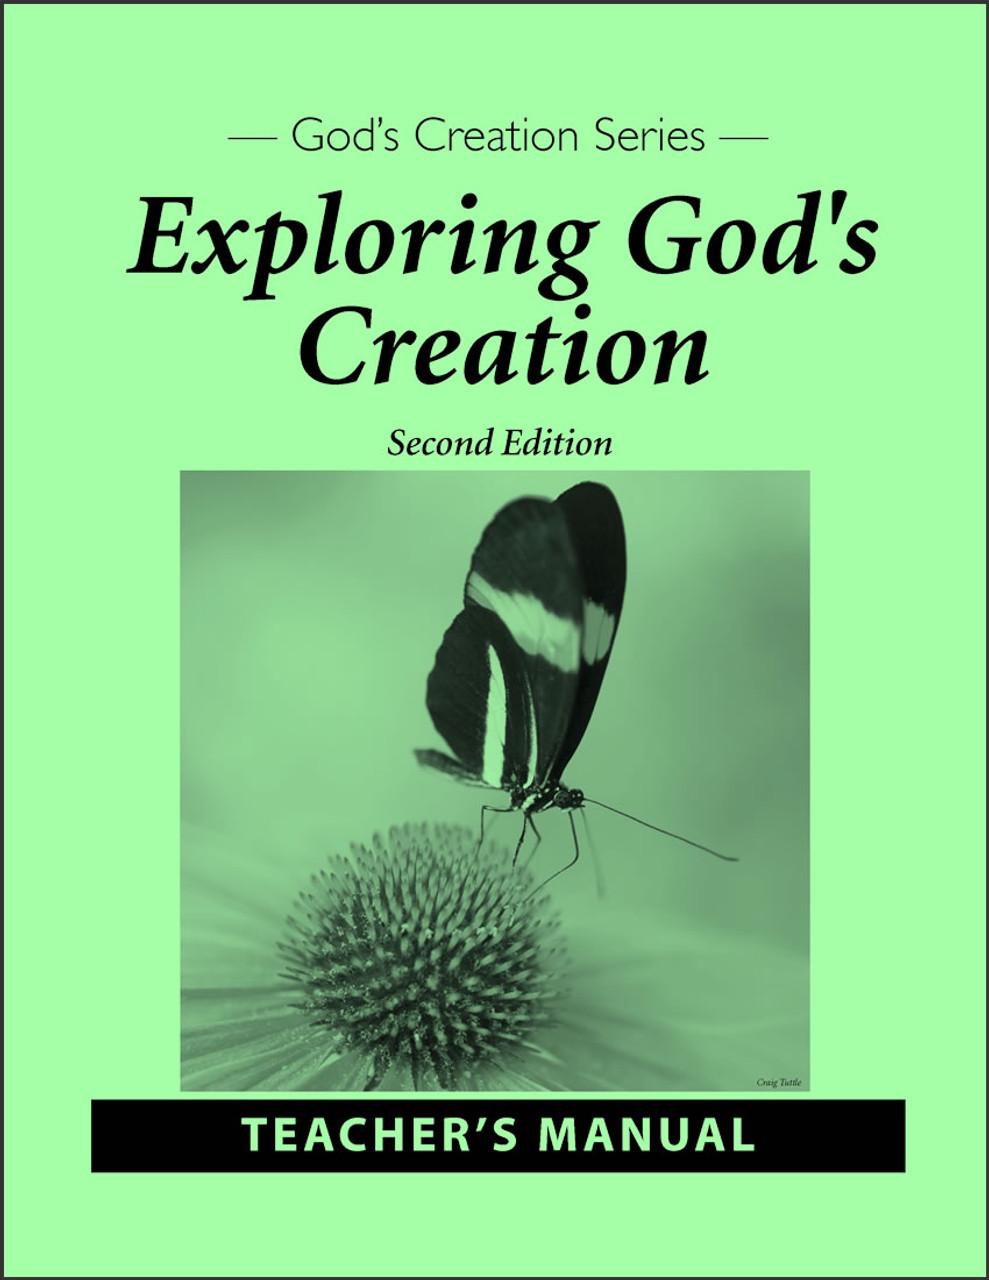 Exploring God's Creation, 2nd edition - Teacher's Manual